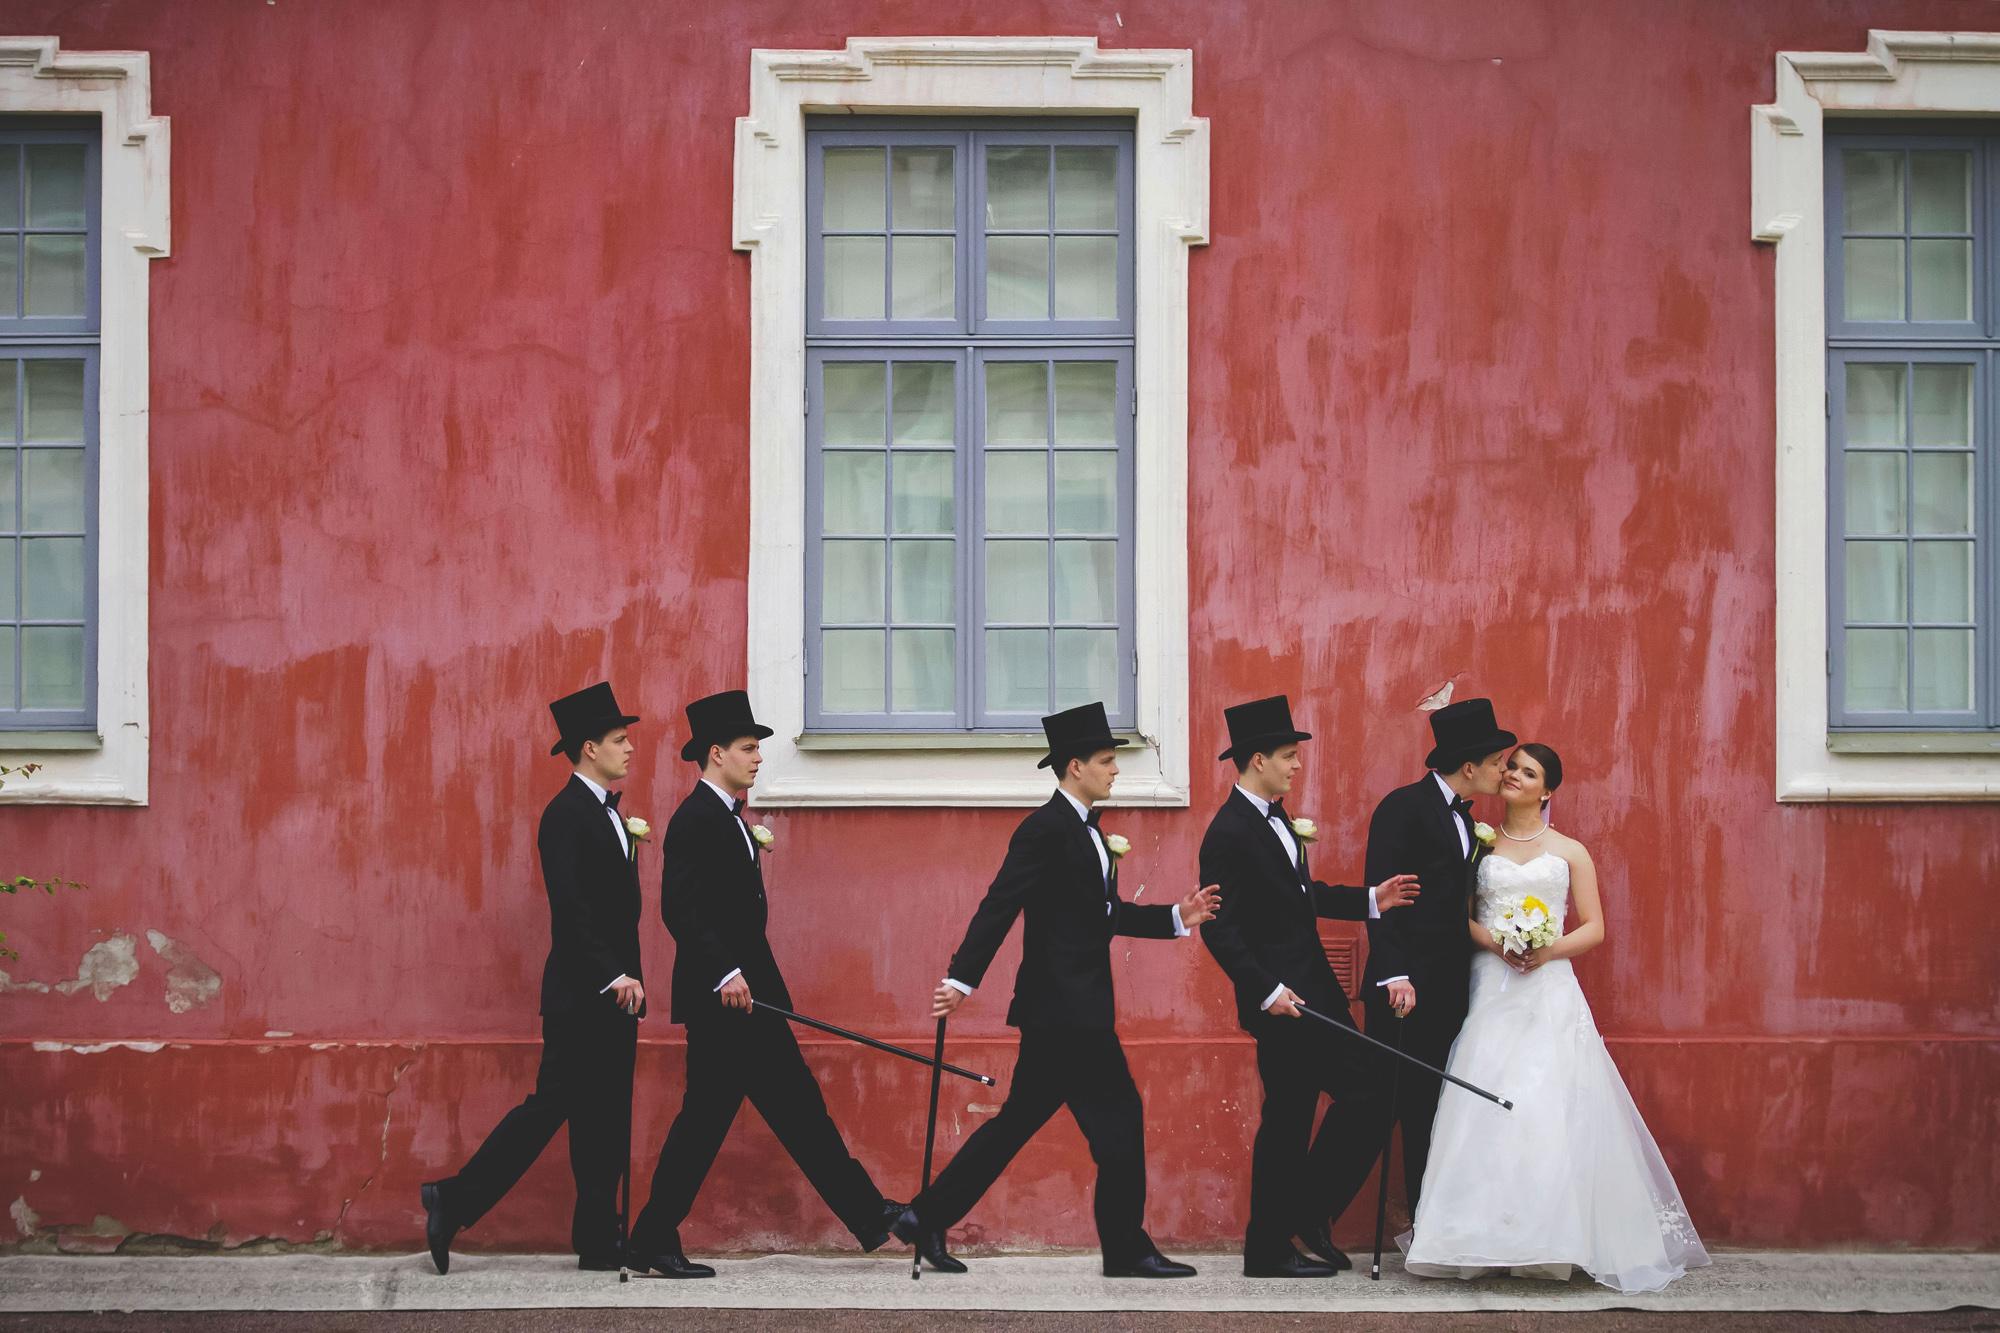 Wedding Photo by Valdur Rosenvald